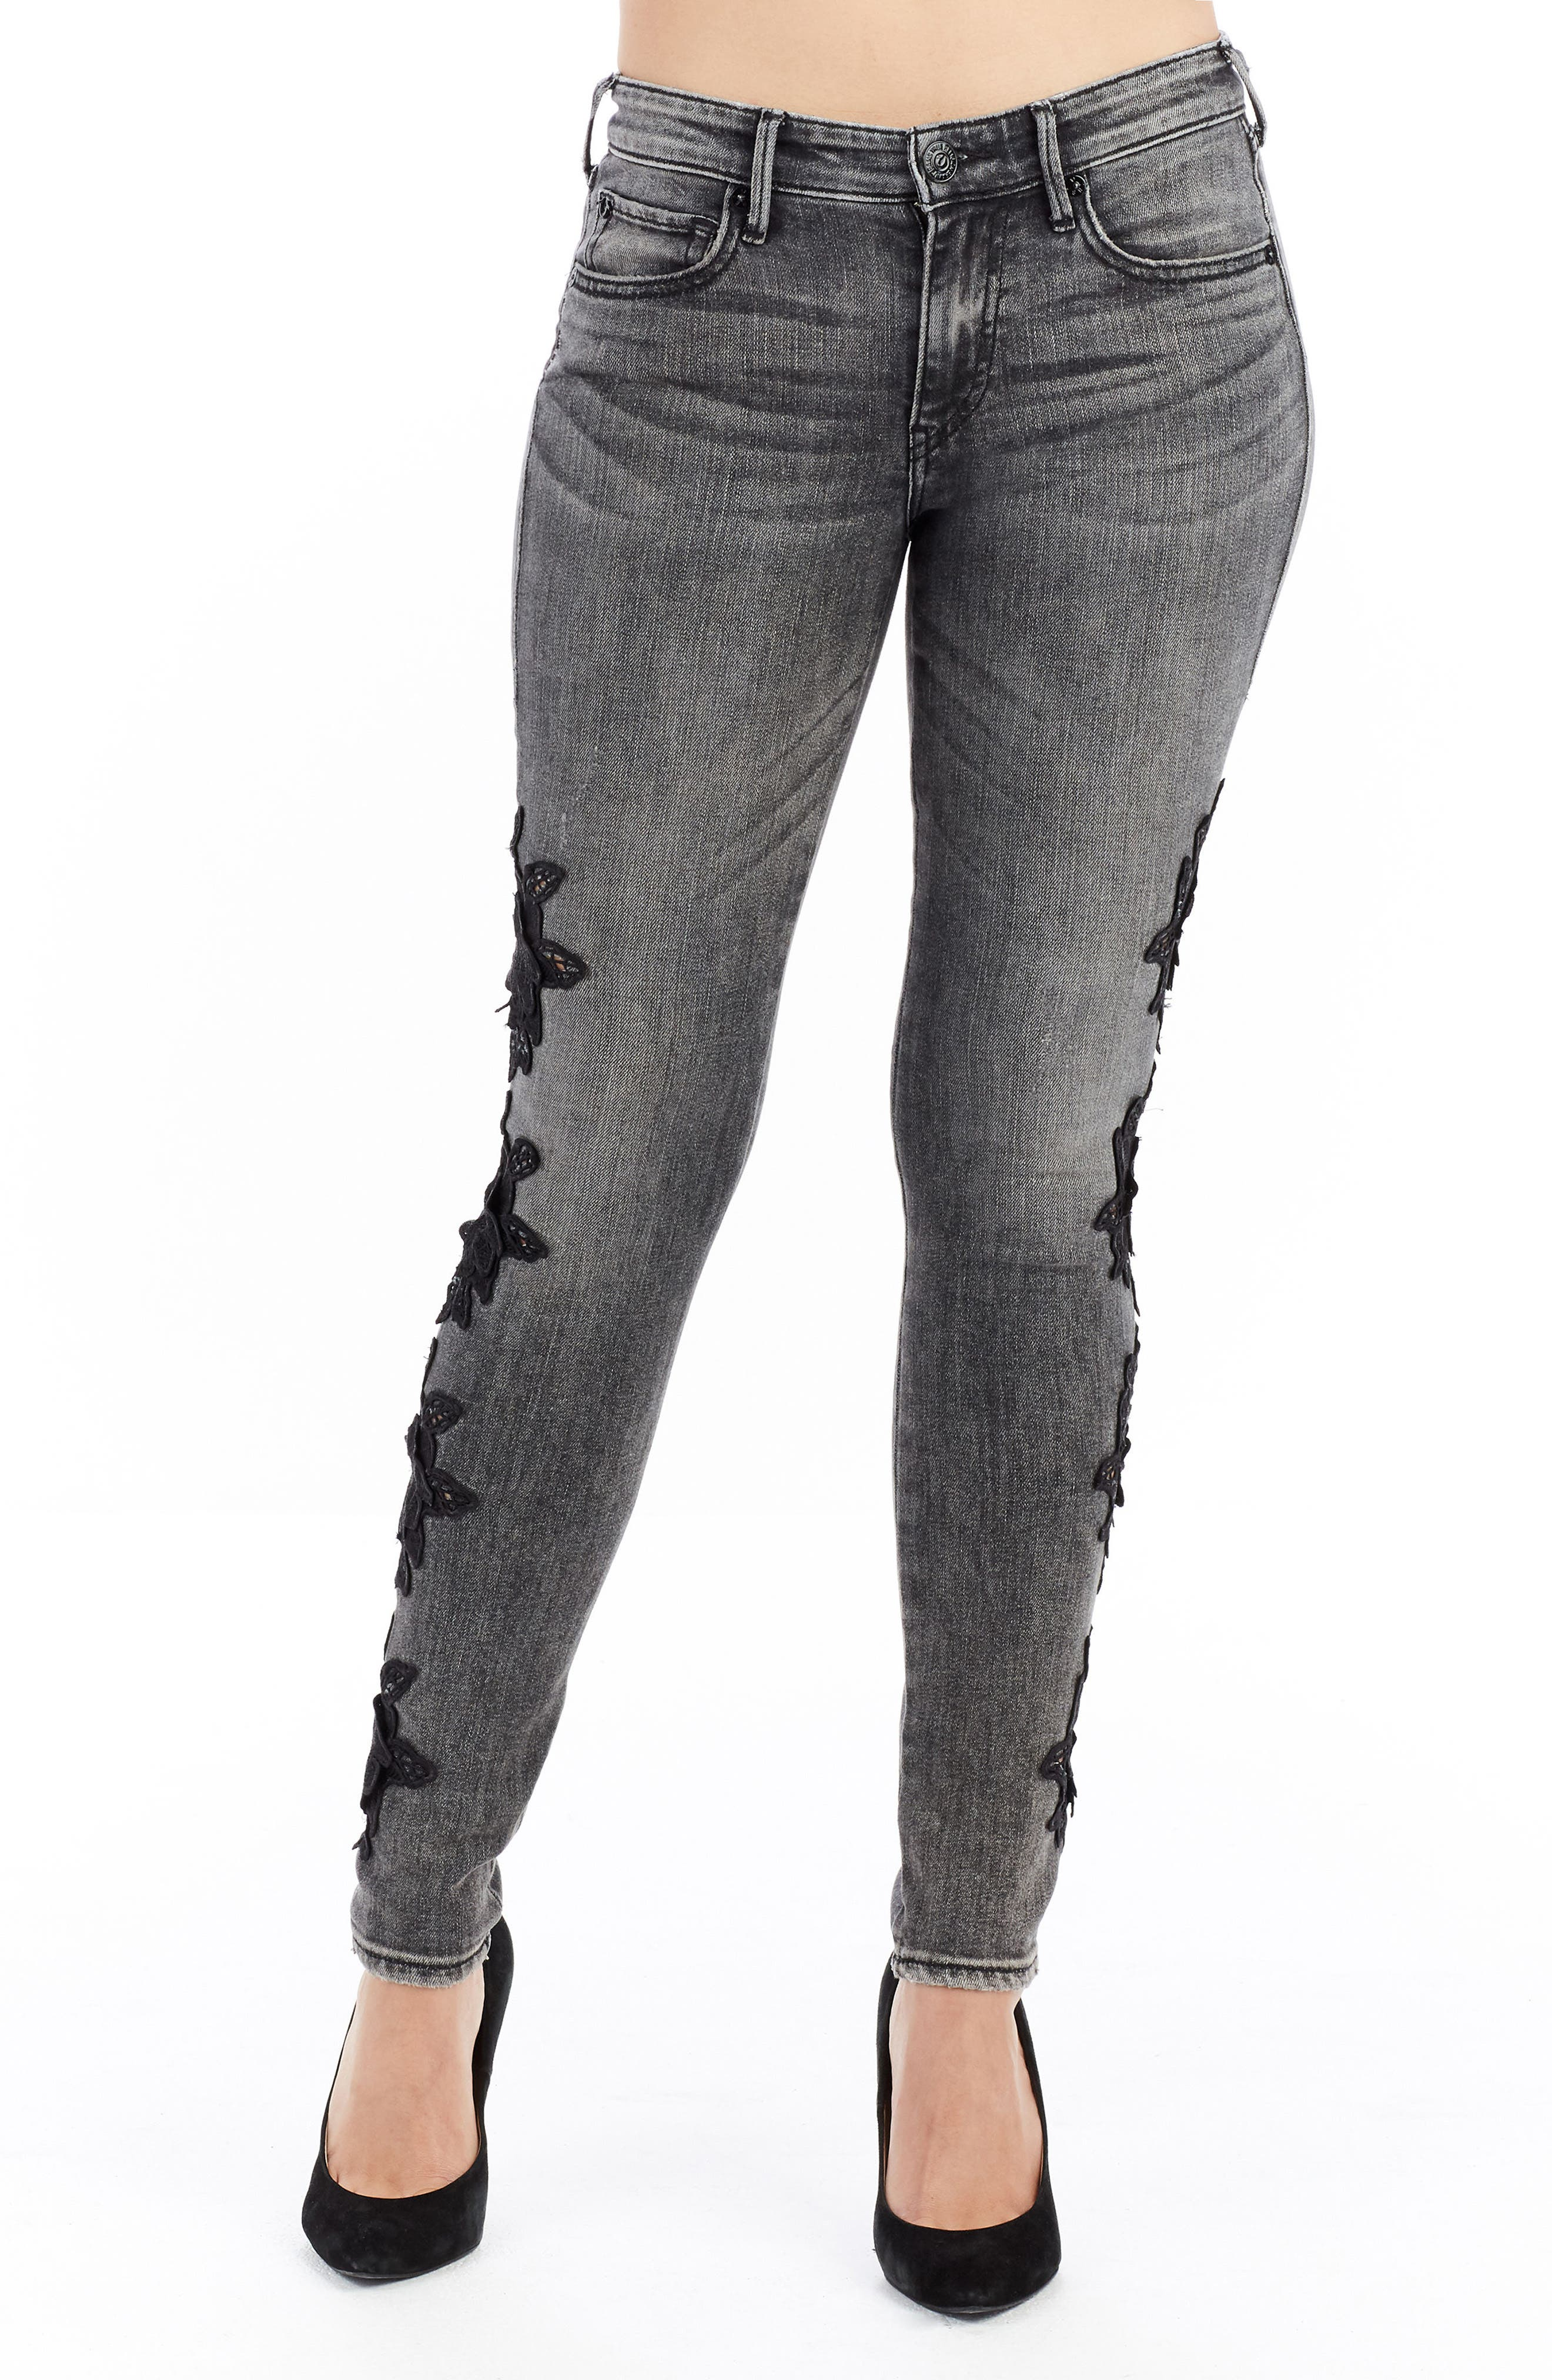 Jennie Curvy Skinny Jeans,                             Main thumbnail 1, color,                             001